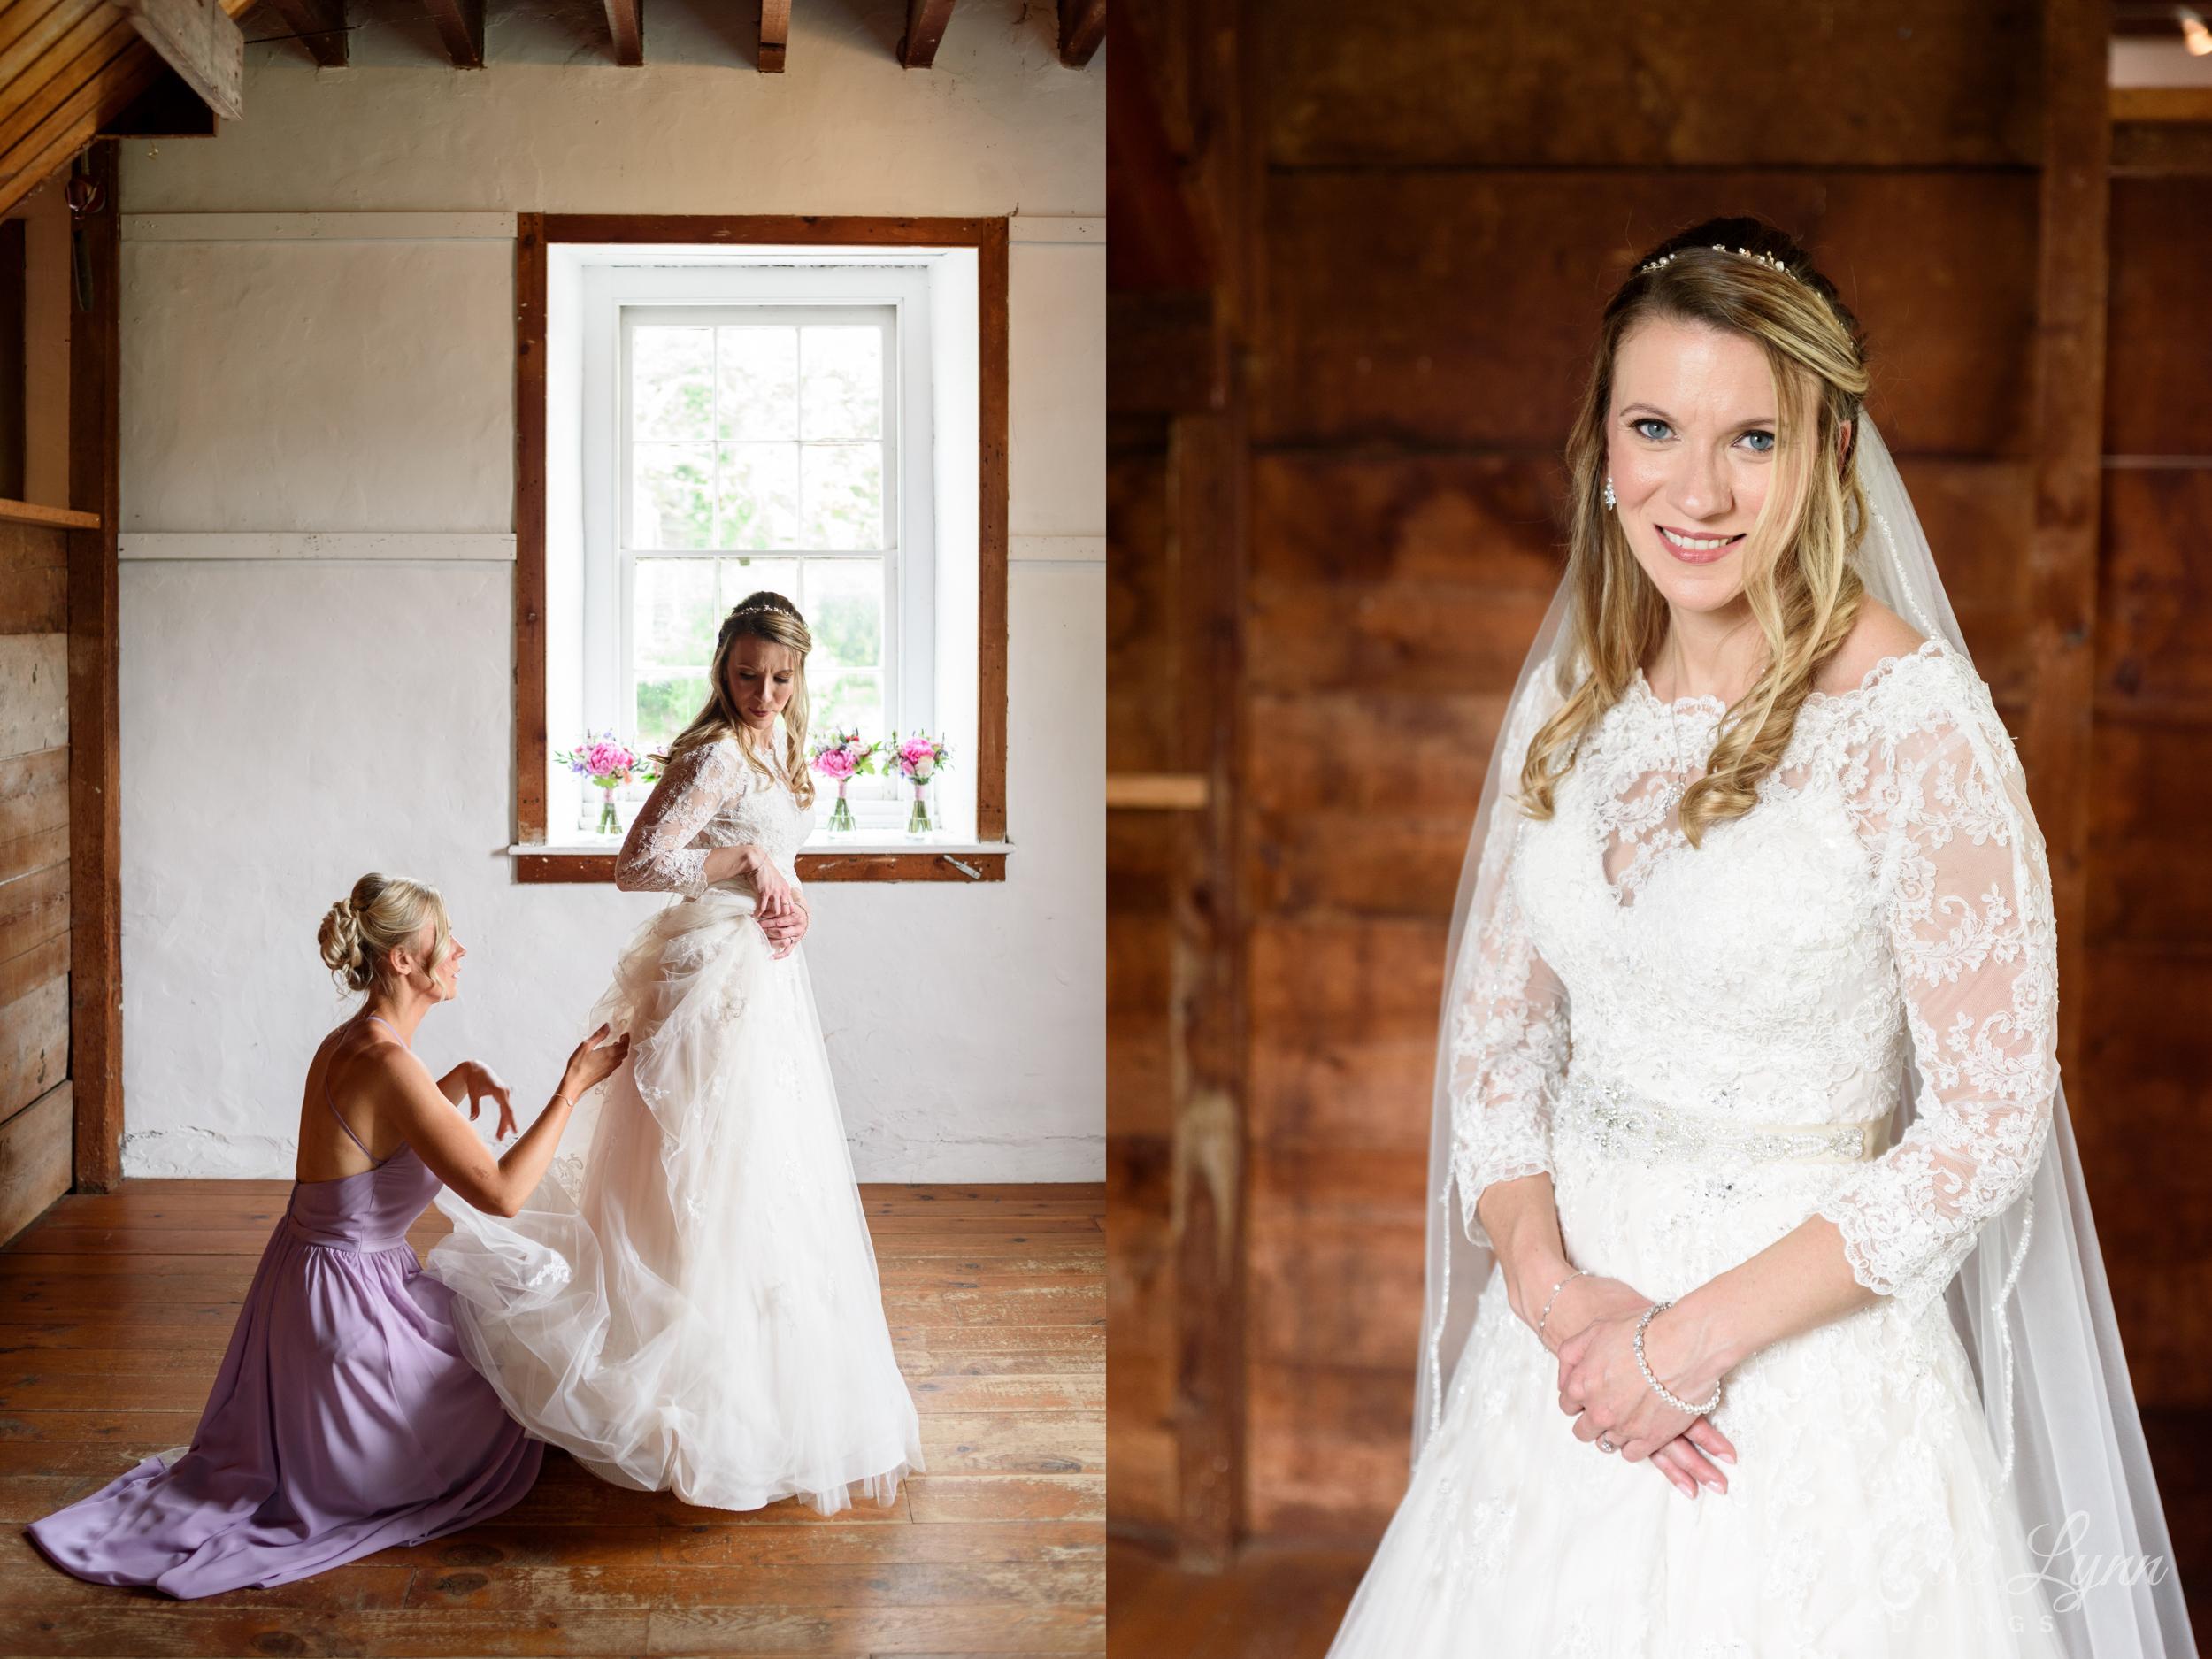 mlw-prallsville-mills-nj-wedding-photographer-11.jpg